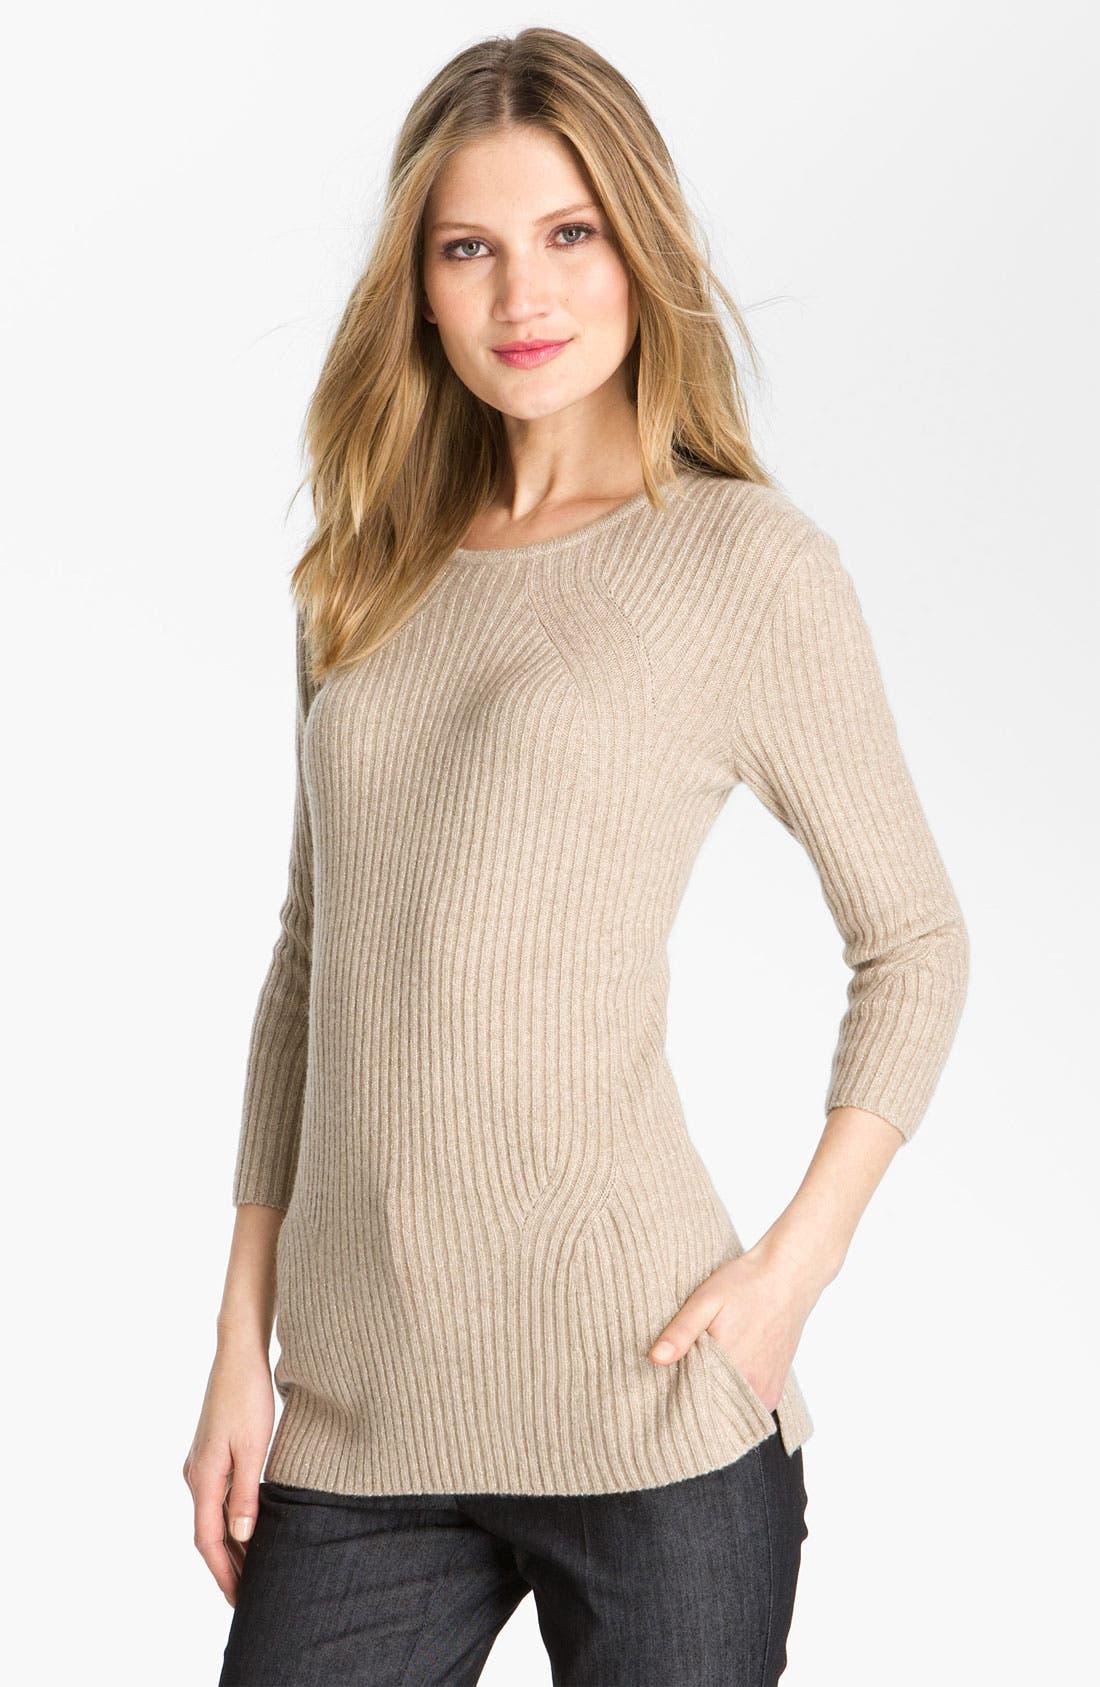 Main Image - St. John Yellow Label Sparkle Rib Knit Sweater